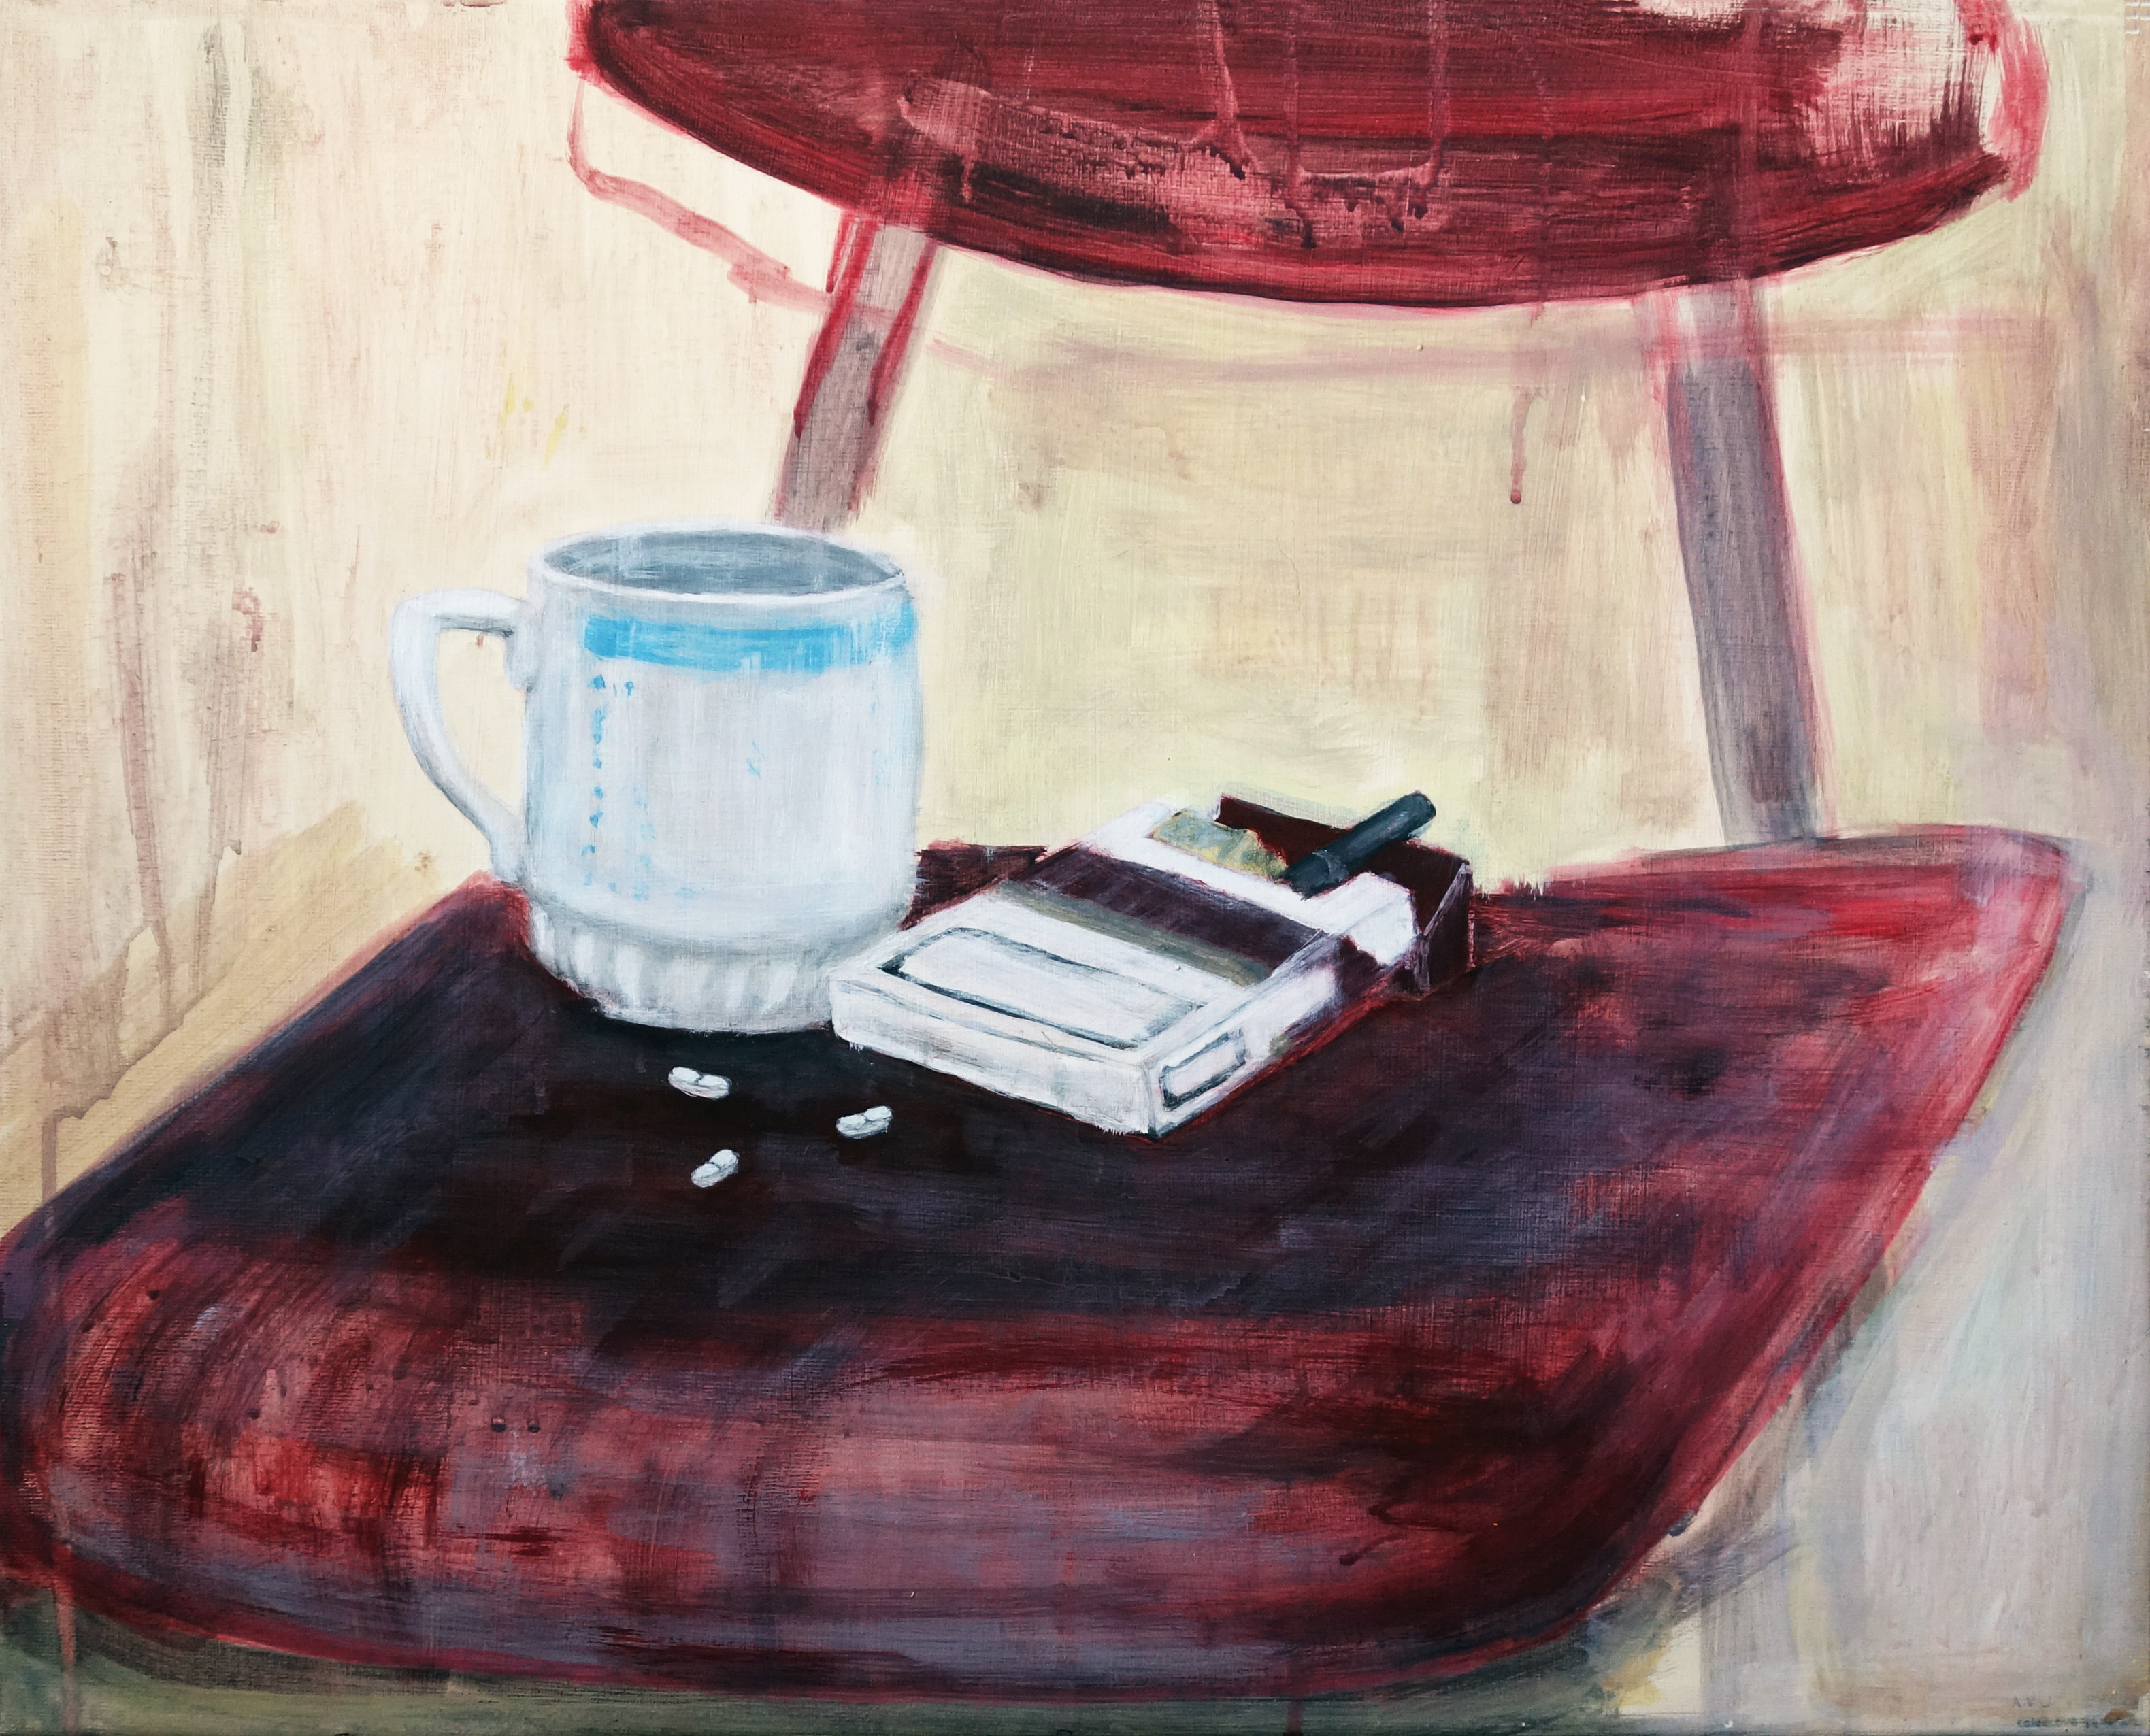 Coffe, cigarettes and pills